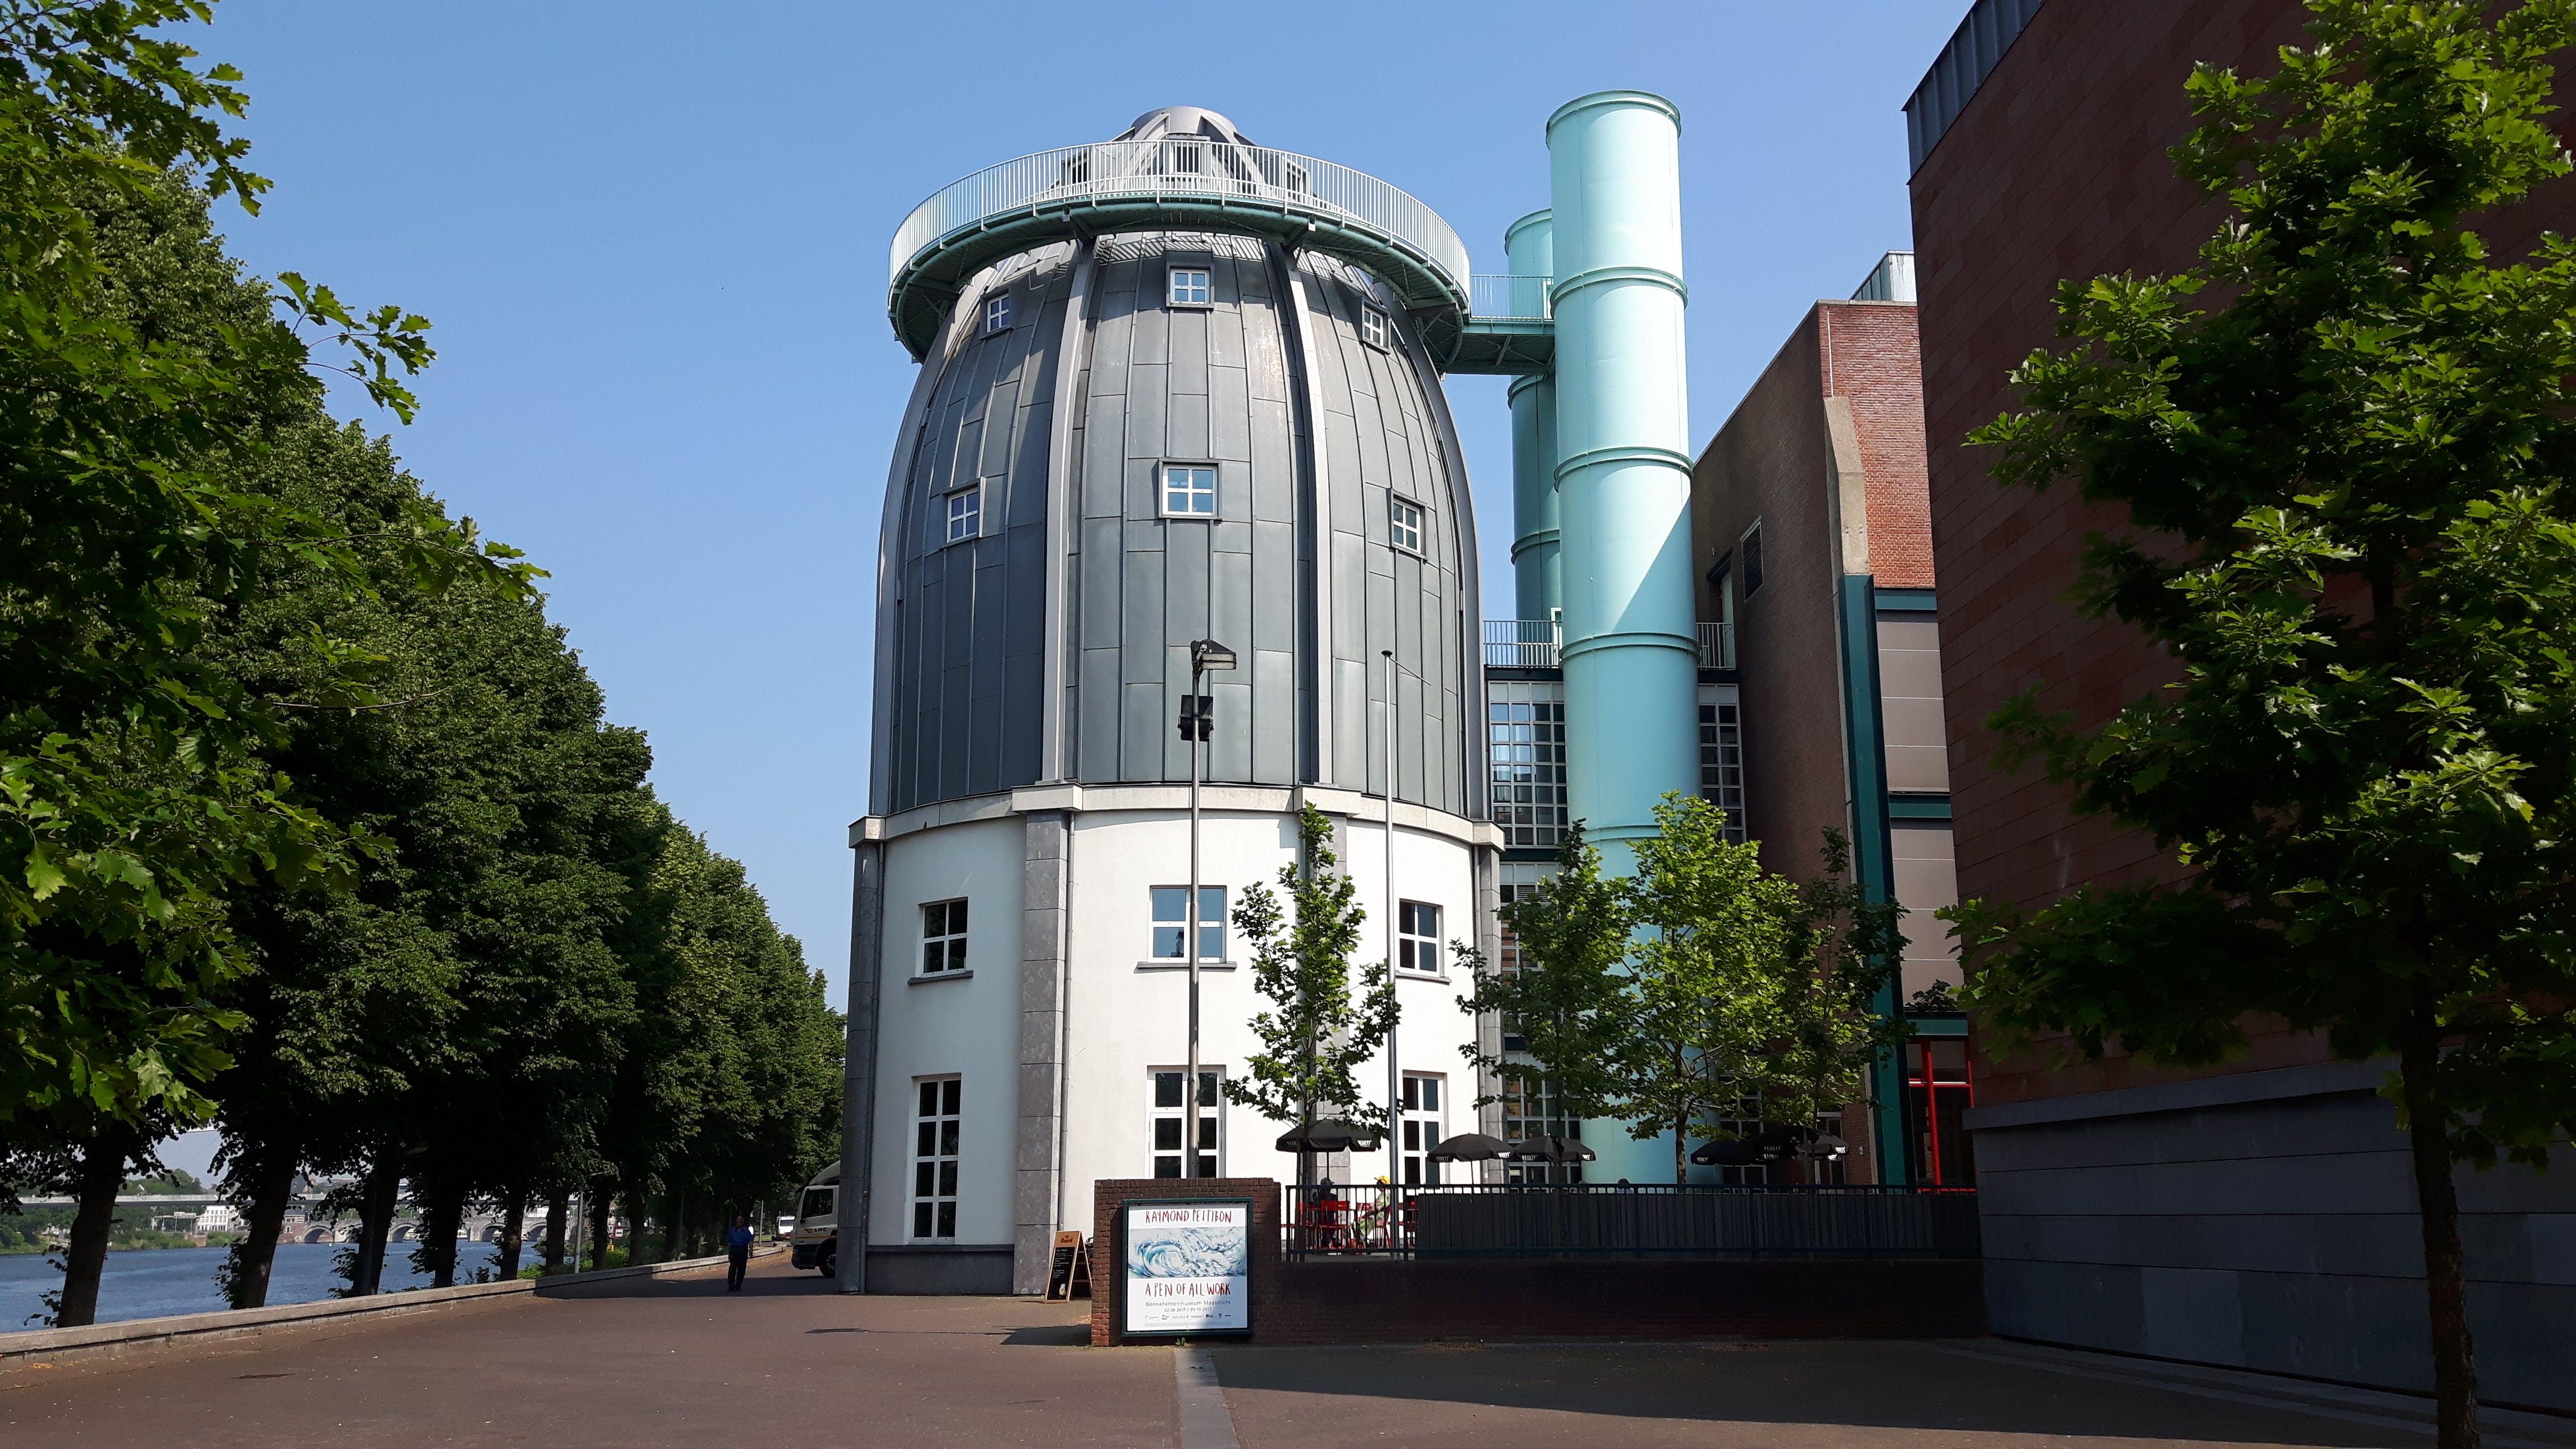 Free stock photo of #bonnefanten museum, #maastricht, #culture, #brightness